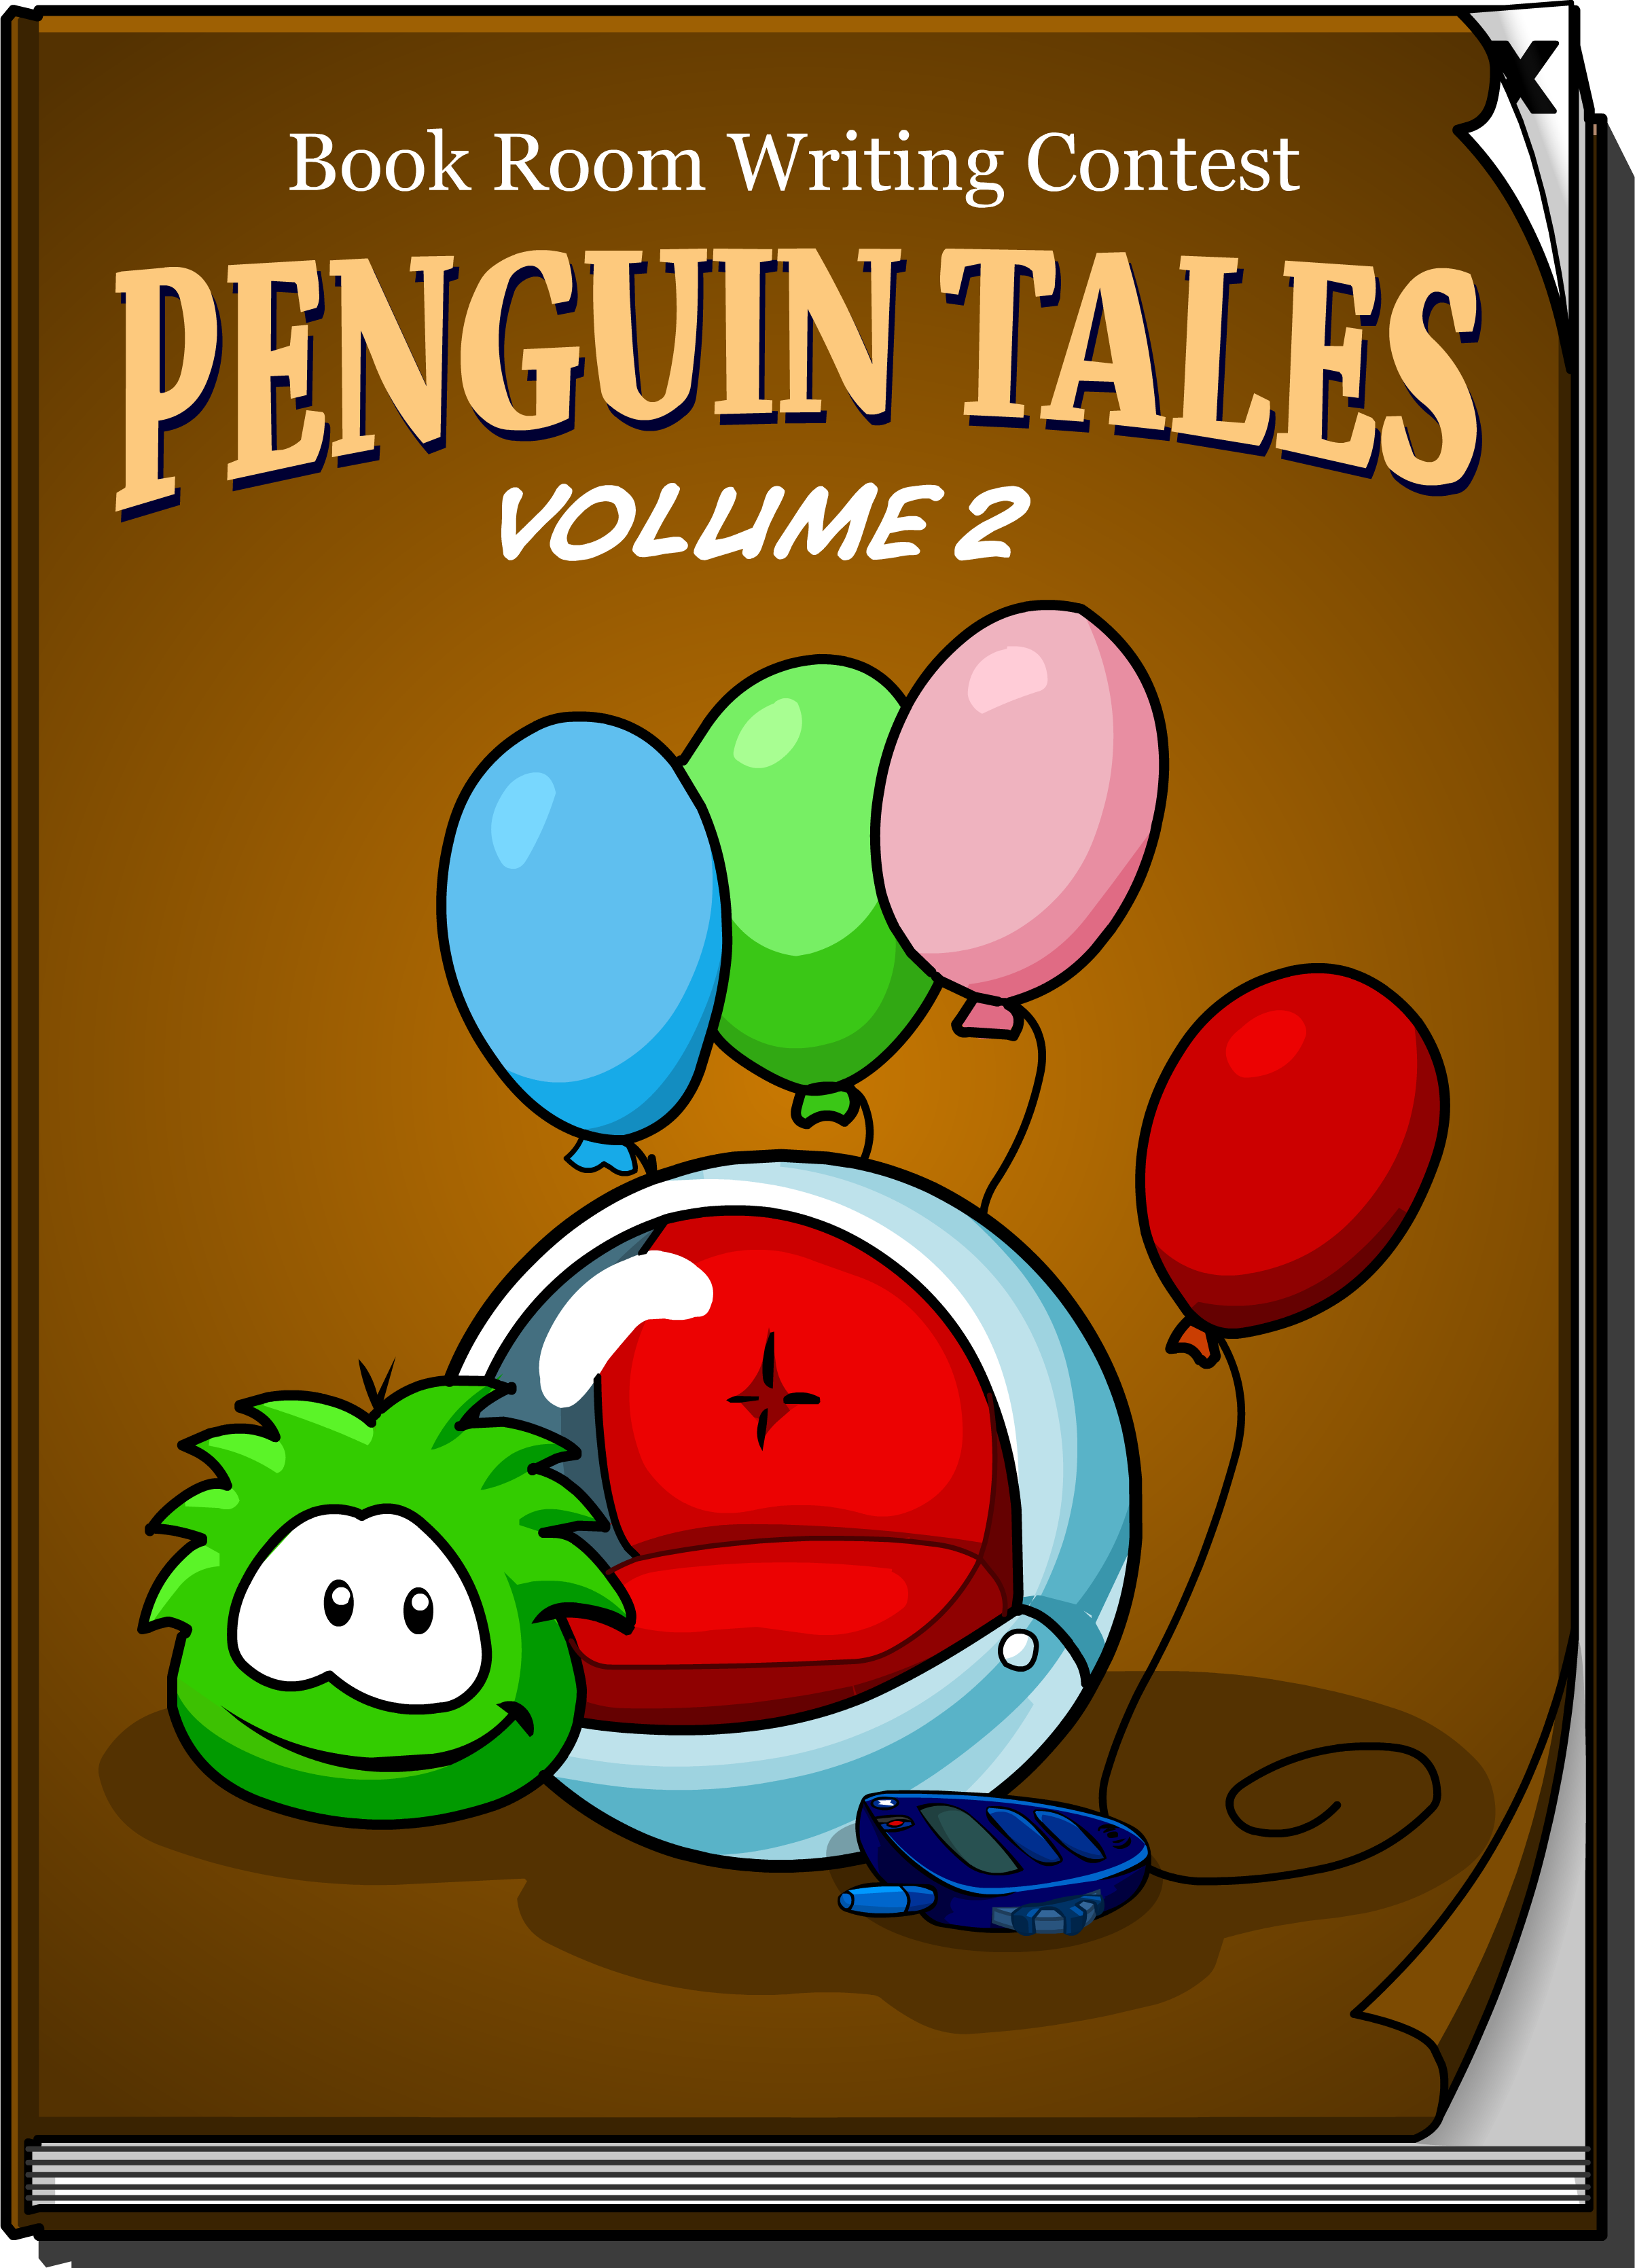 Penguin Tales: Volume 2